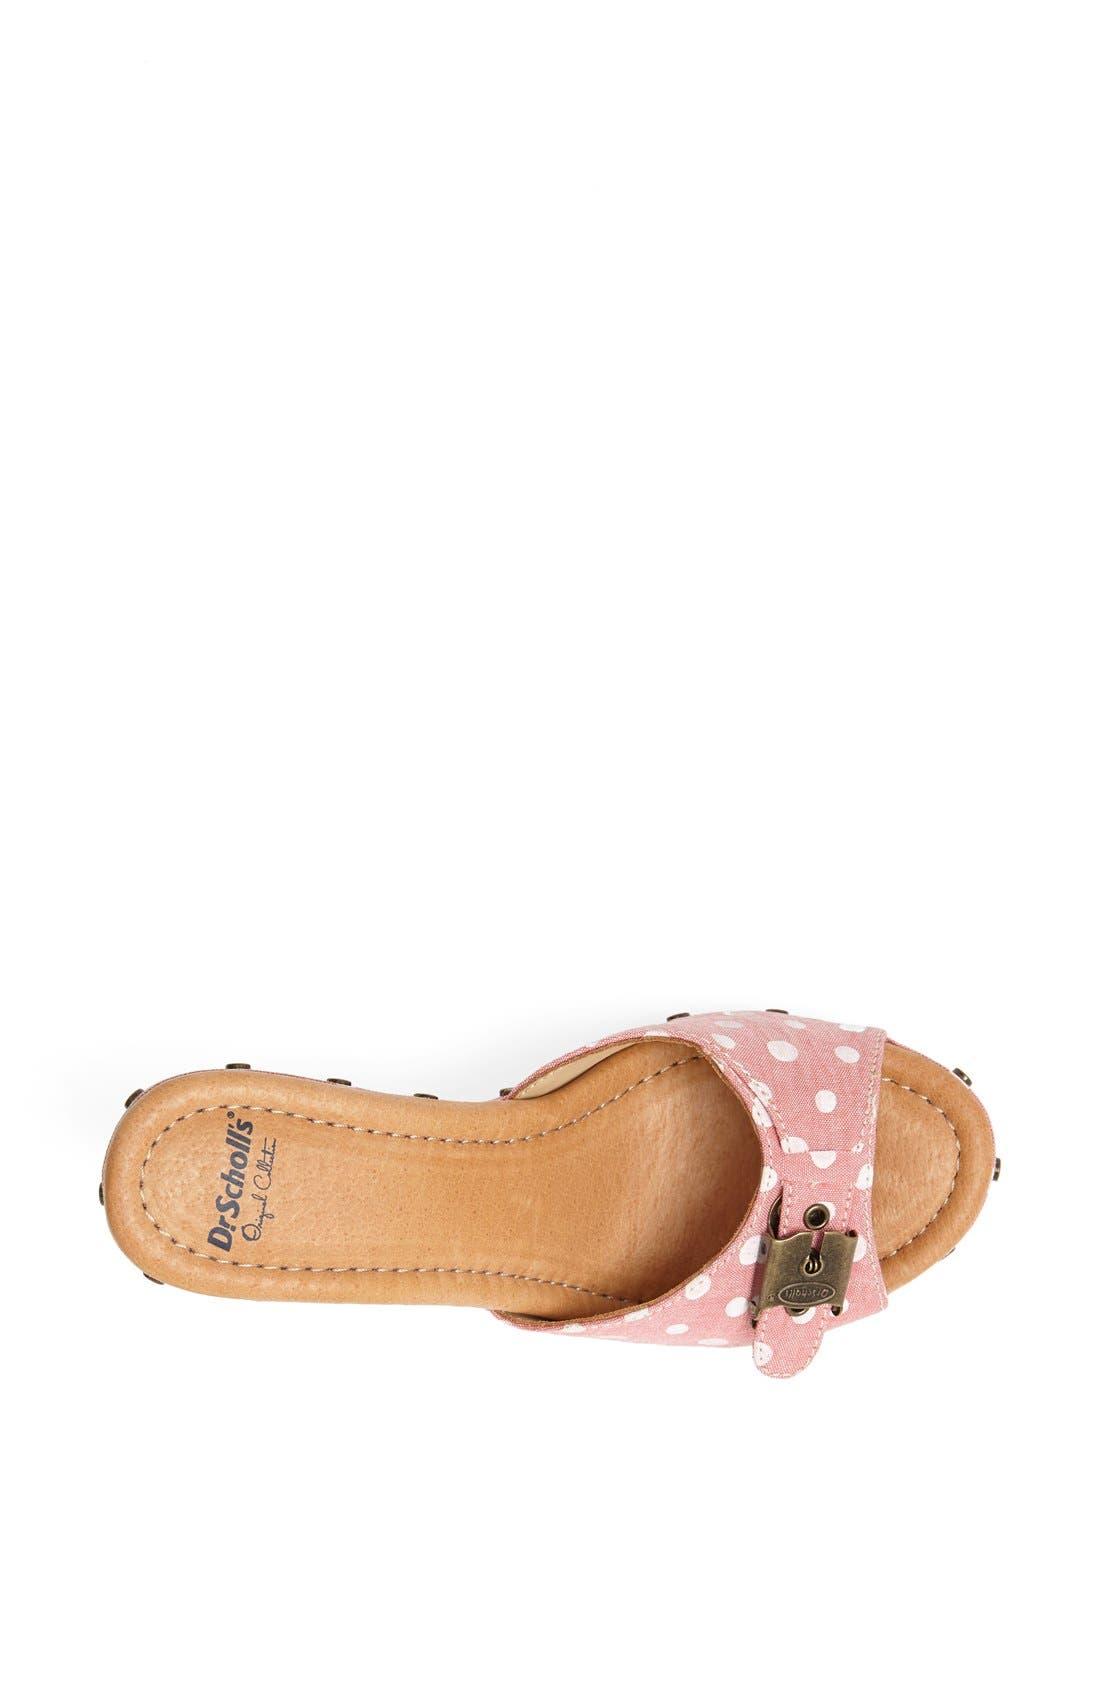 Alternate Image 3  - Dr. Scholl's 'Lia' Leather Sandal